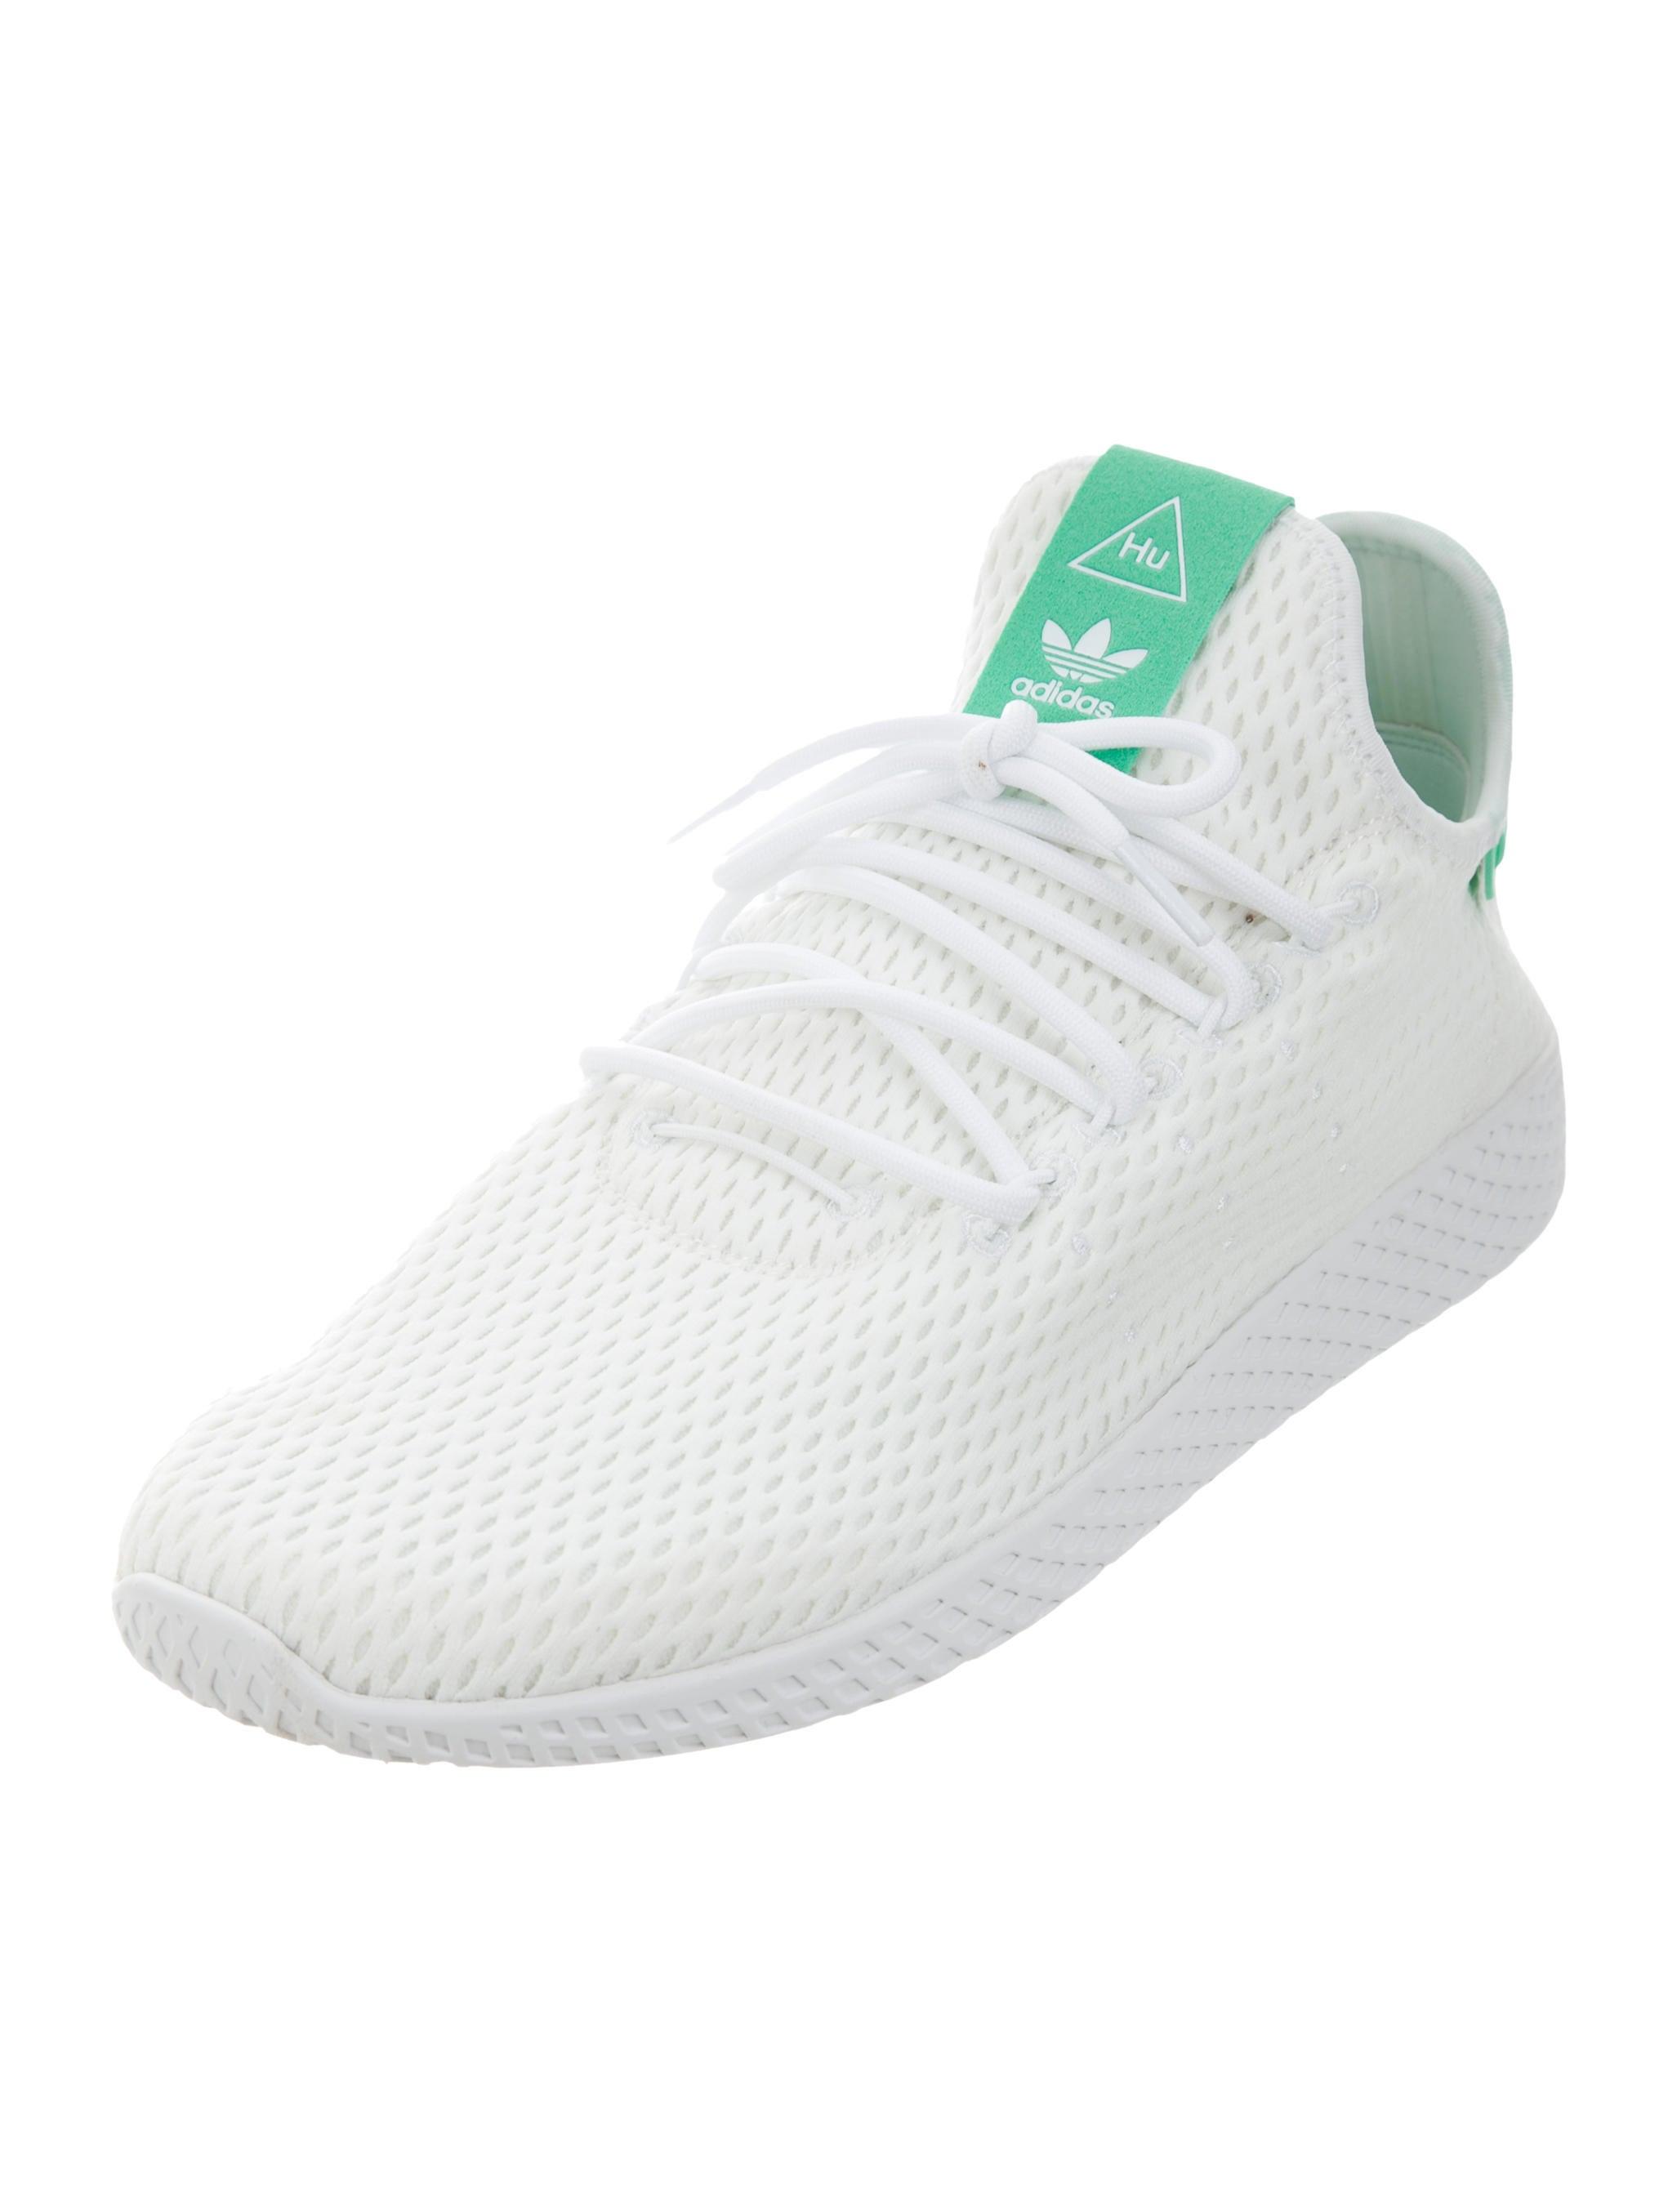 Pharrell williams x adidas mesh tennis hu sneakers w tags for Fish tennis shoes